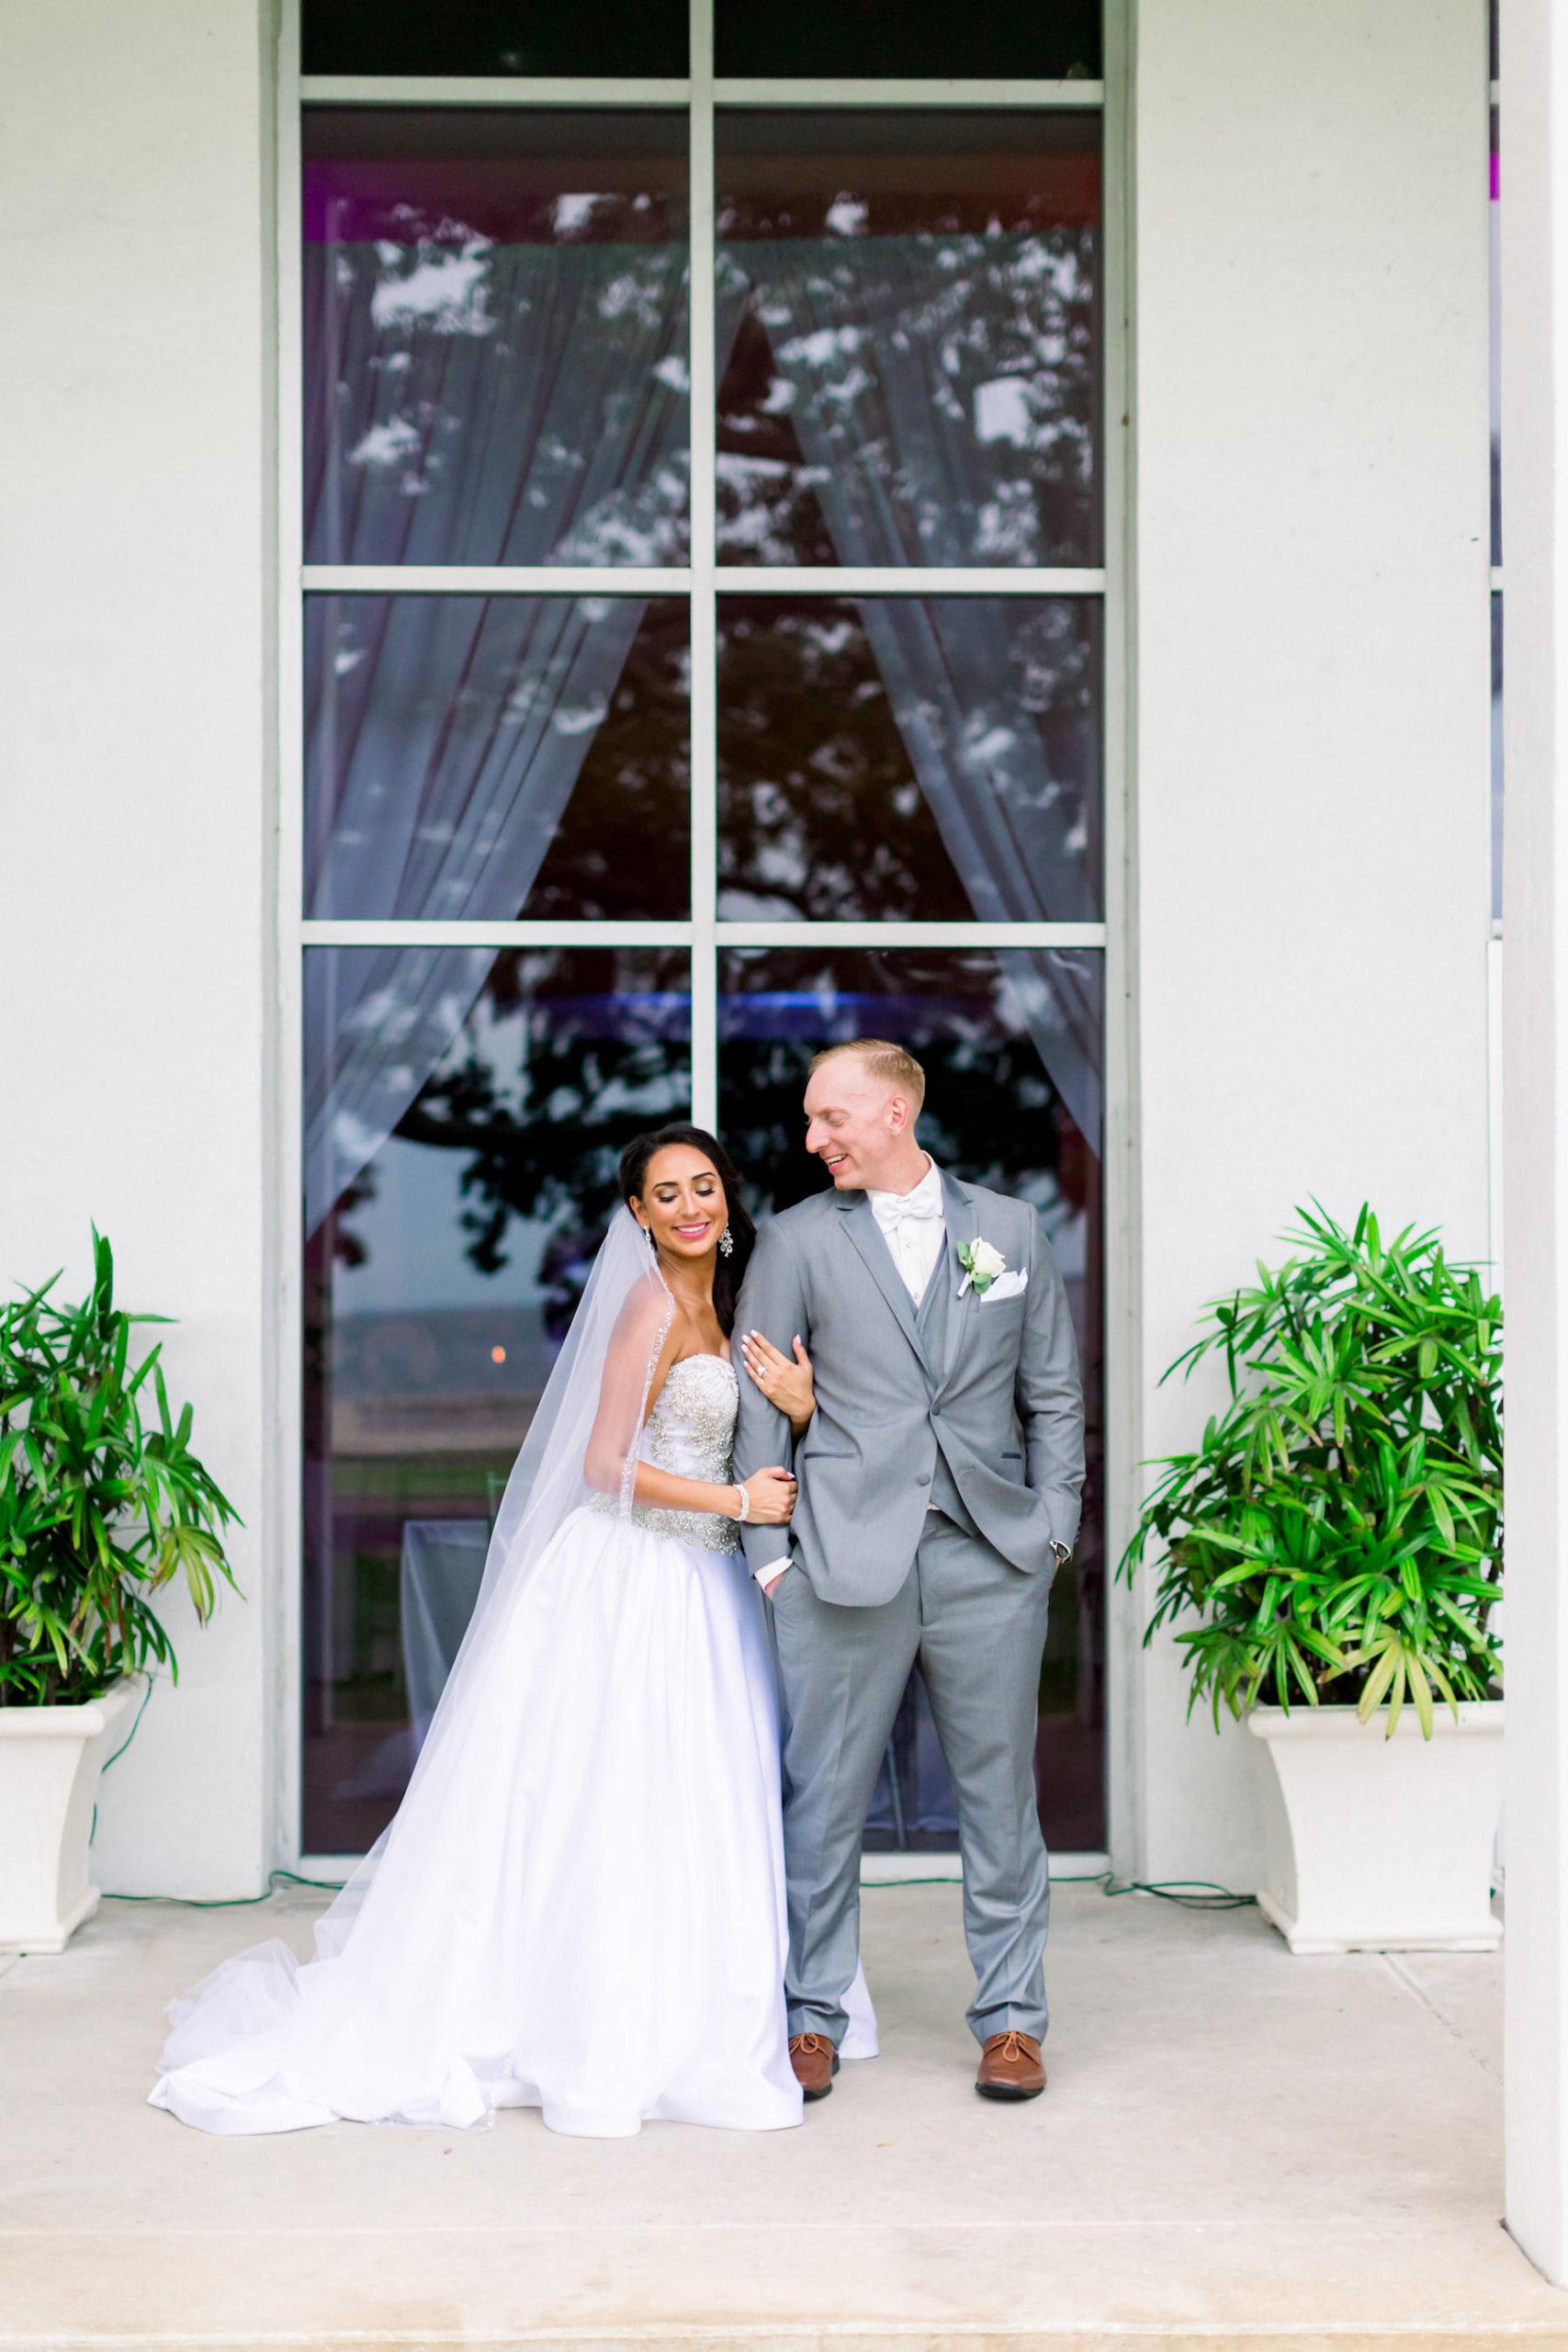 Romantic Bride and Groom Wedding Portrait | Wedding Venue Tampa Garden Club | Wedding Photographer Shauna and Jordon Photography | Wedding Dress Truly Forever Bridal